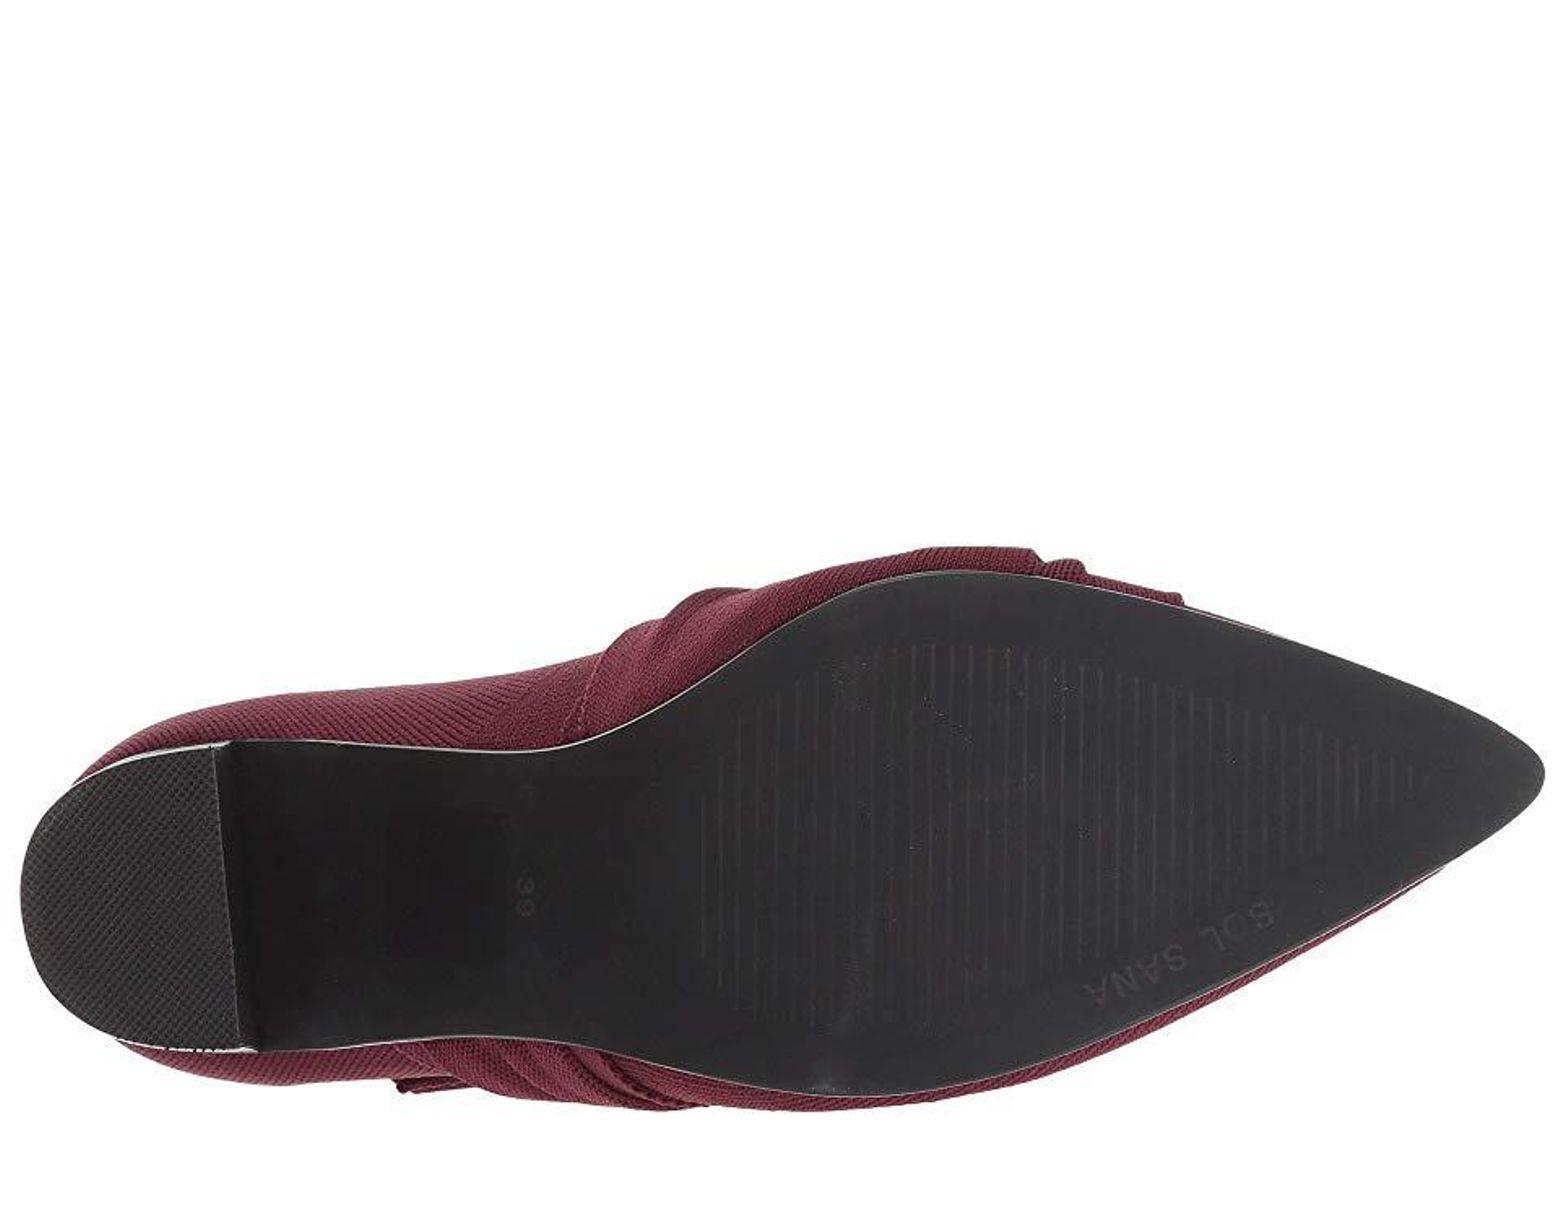 84f251e0 Sol Sana Liana Boot (burgundy) Boots in Purple - Save 34% - Lyst